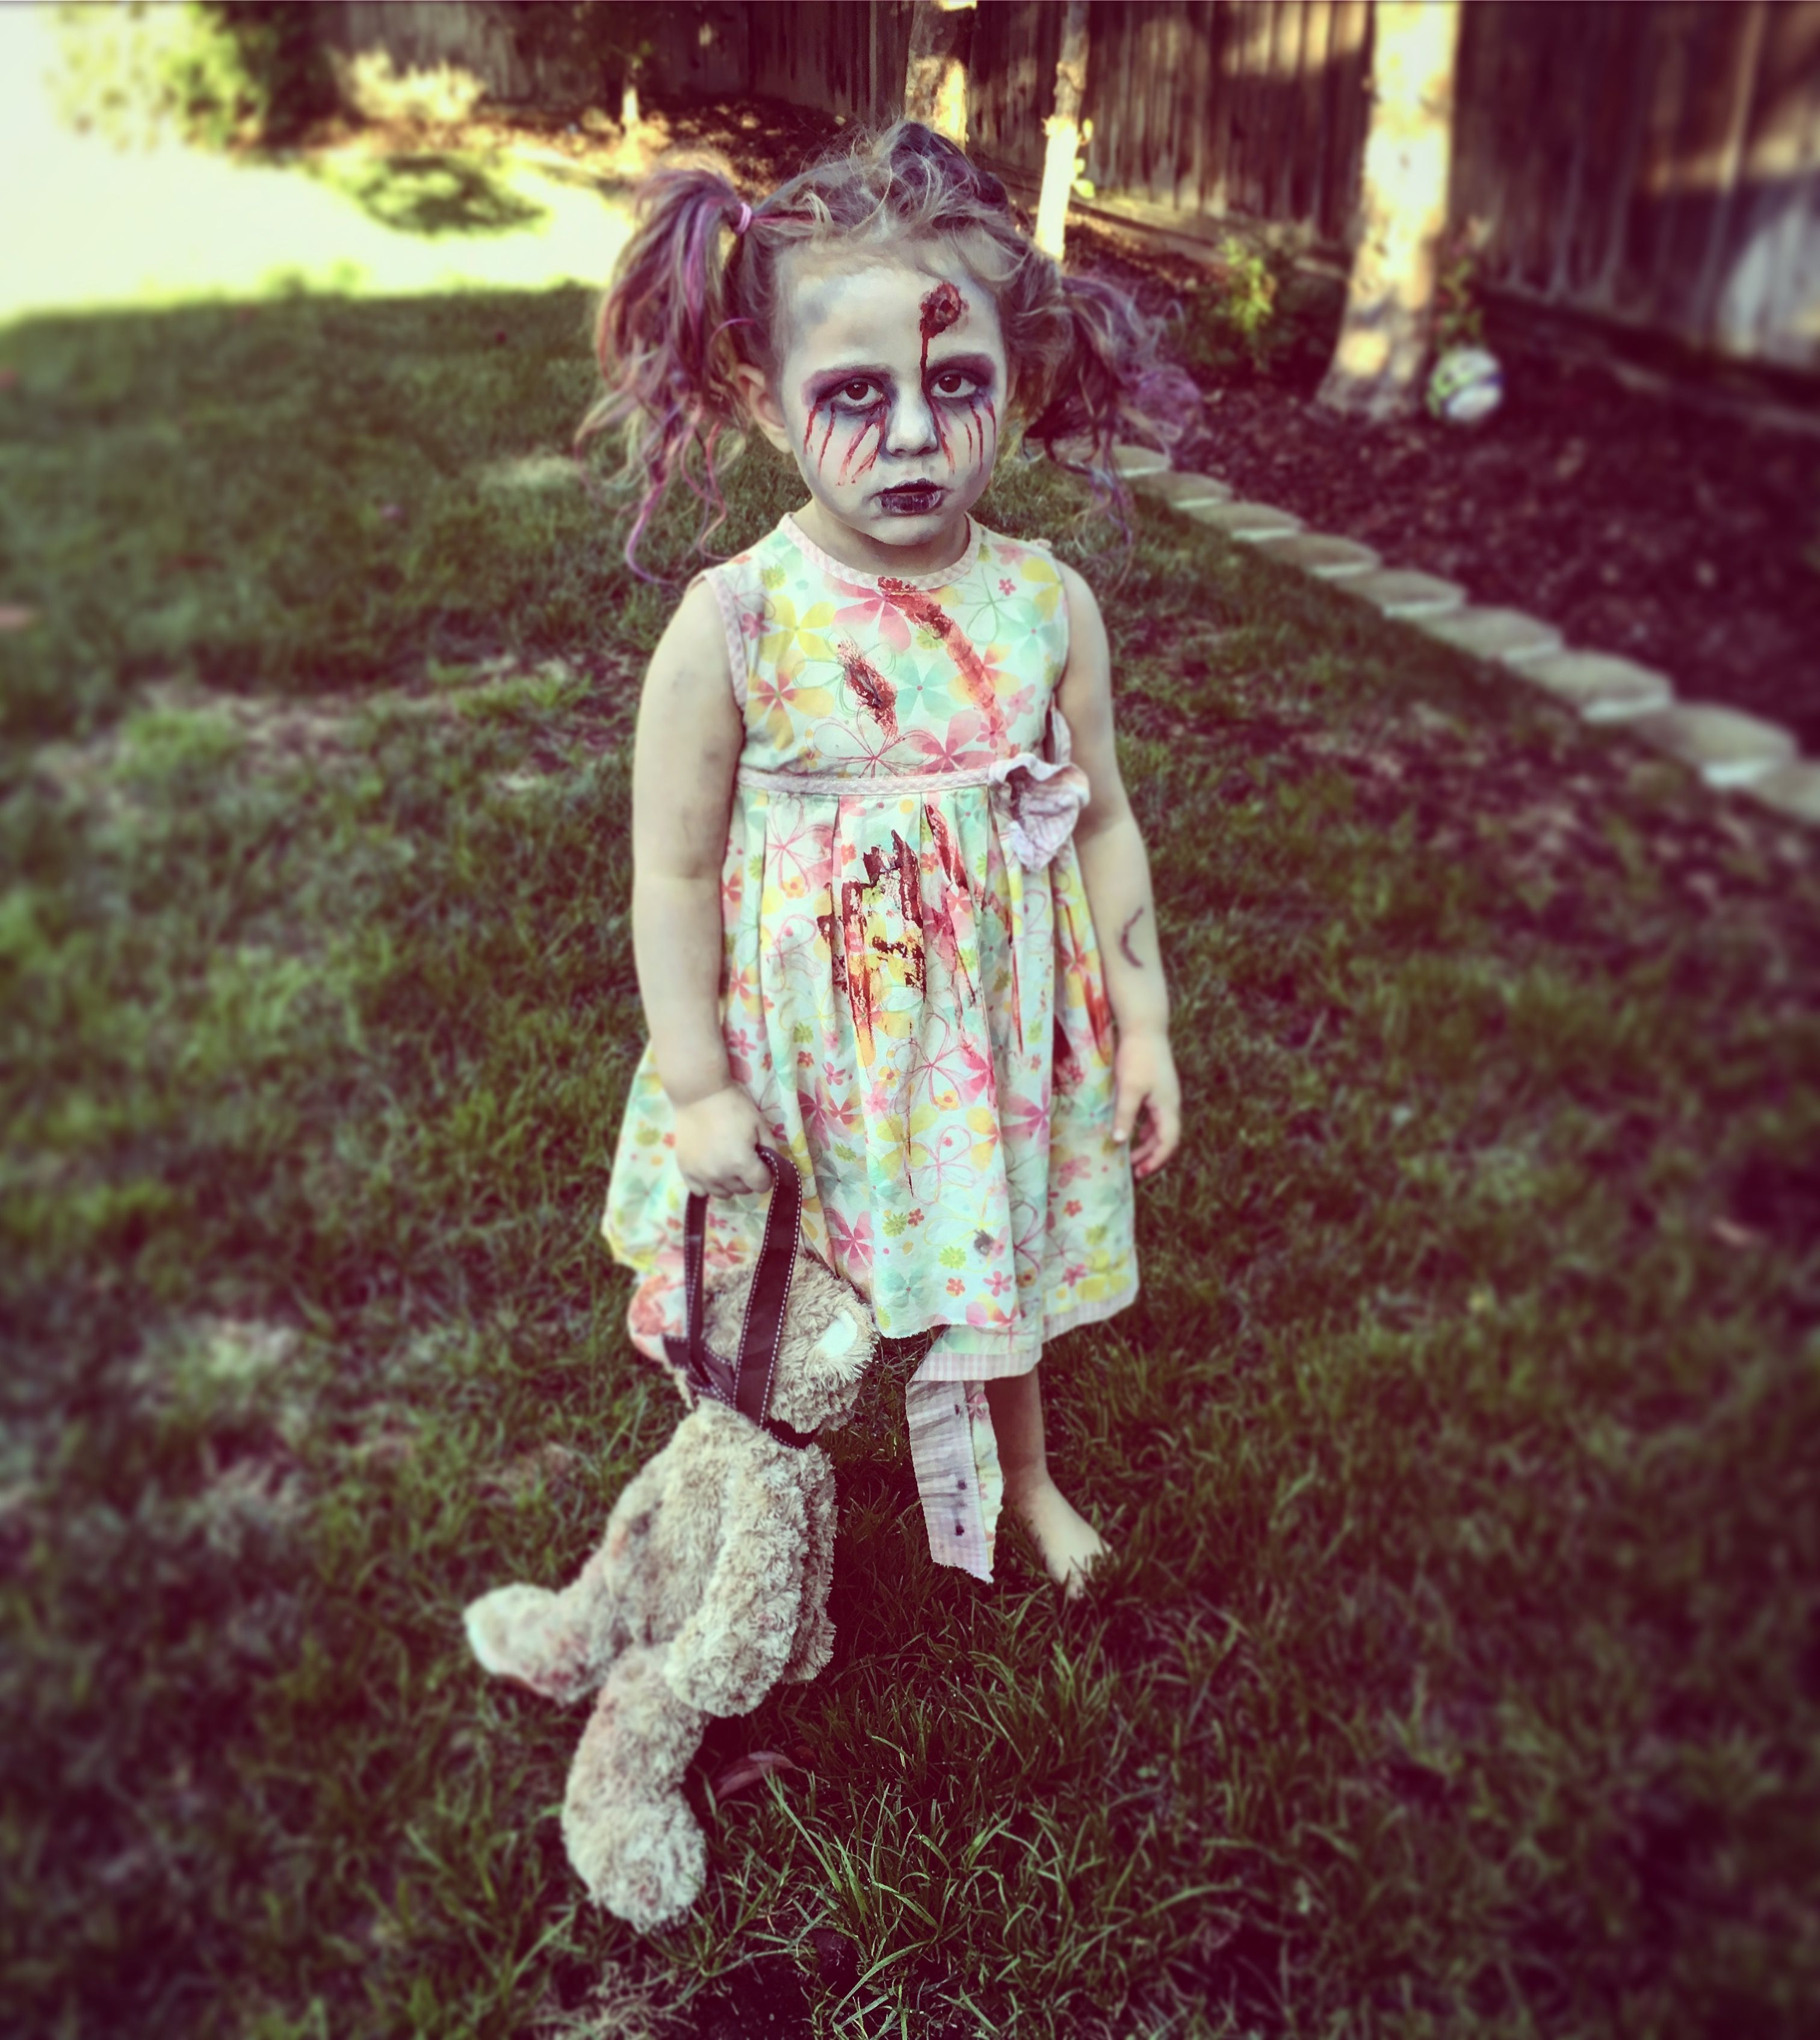 Halloween Costumes 2020 Zombie Toddler Zombie Costume Girl ` Toddler Zombie Costume Girl in 2020